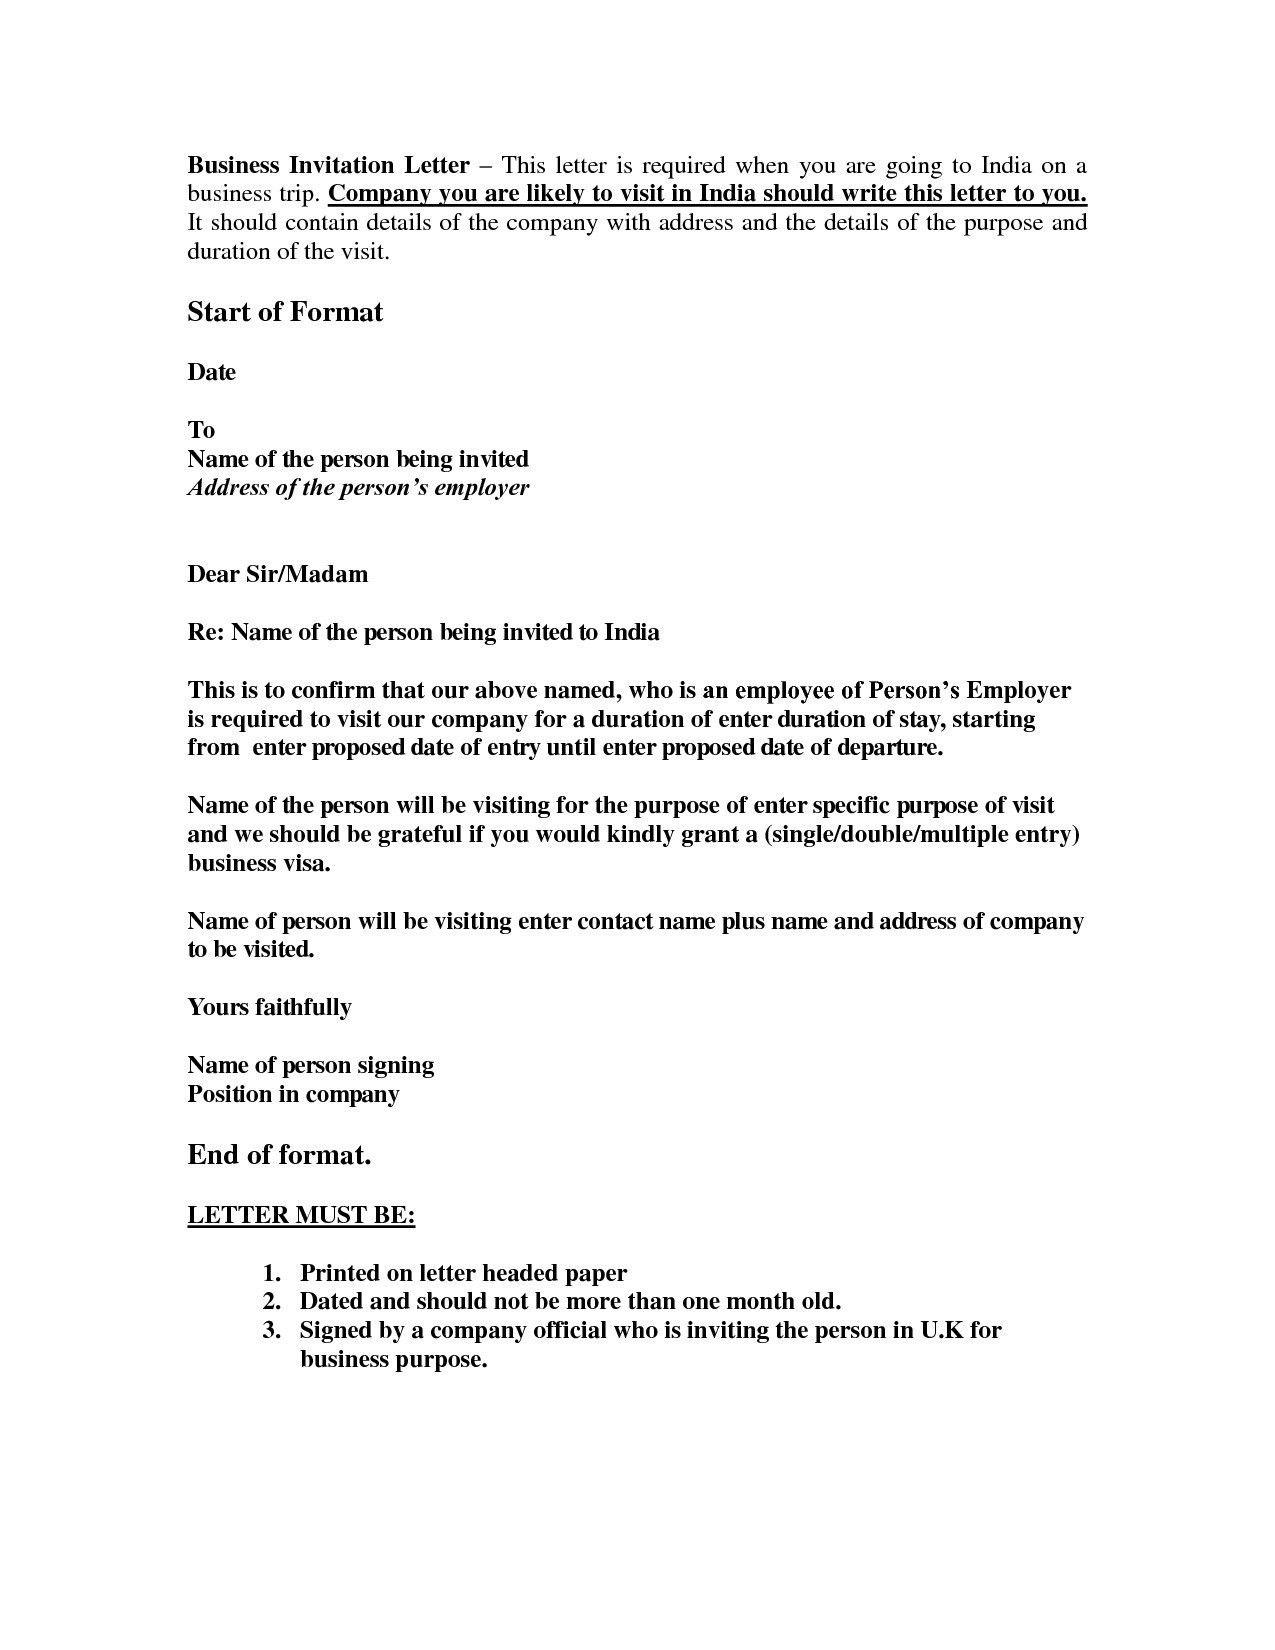 283368e8511427faa7e9cd013b256f44 Visa Application Letter Doc on visa work permit, passport application letter, visa advertising, google application letter, personal application letter, visa support letter, application cover letter, visa covering letter, loan application letter, visa cover letter, visa business letter, visa application form, visa request letter sample, registration application letter, university application letter, school application letter, visa petition letter, visa approval letter, work visa letter, visa processing letter,